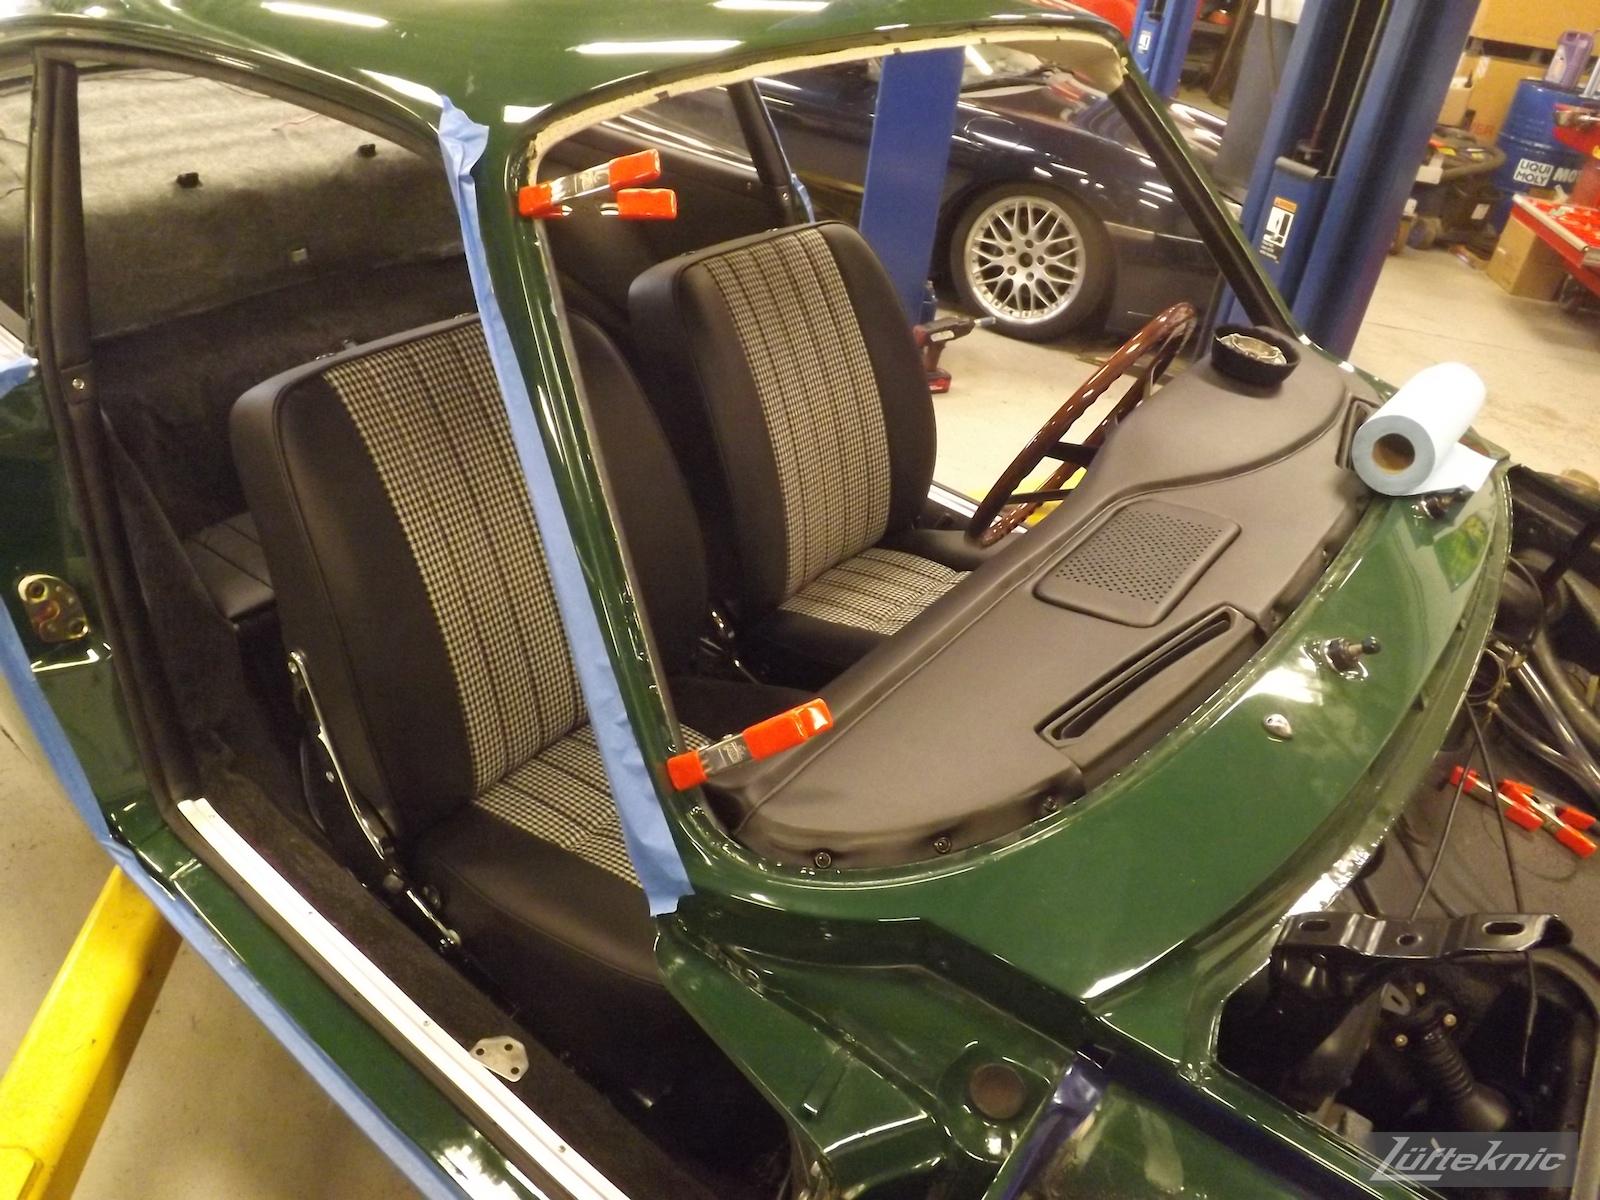 Finishing the interior reassembly of an Irish Green Porsche 912 undergoing restoration at Lufteknic.